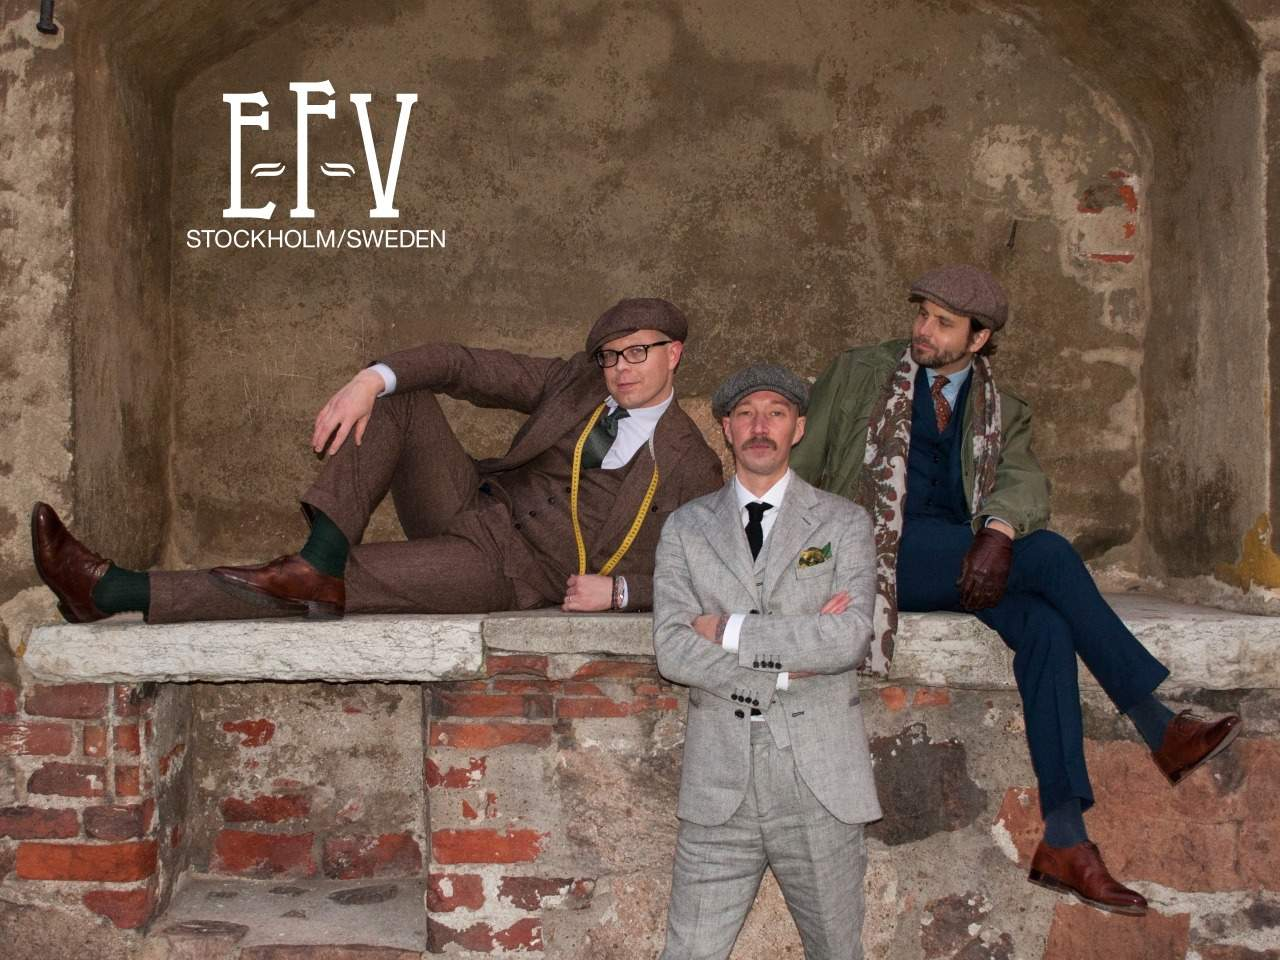 Jussi Häkkinen, Lars Holmberg and Erik Mannby of E-F-V